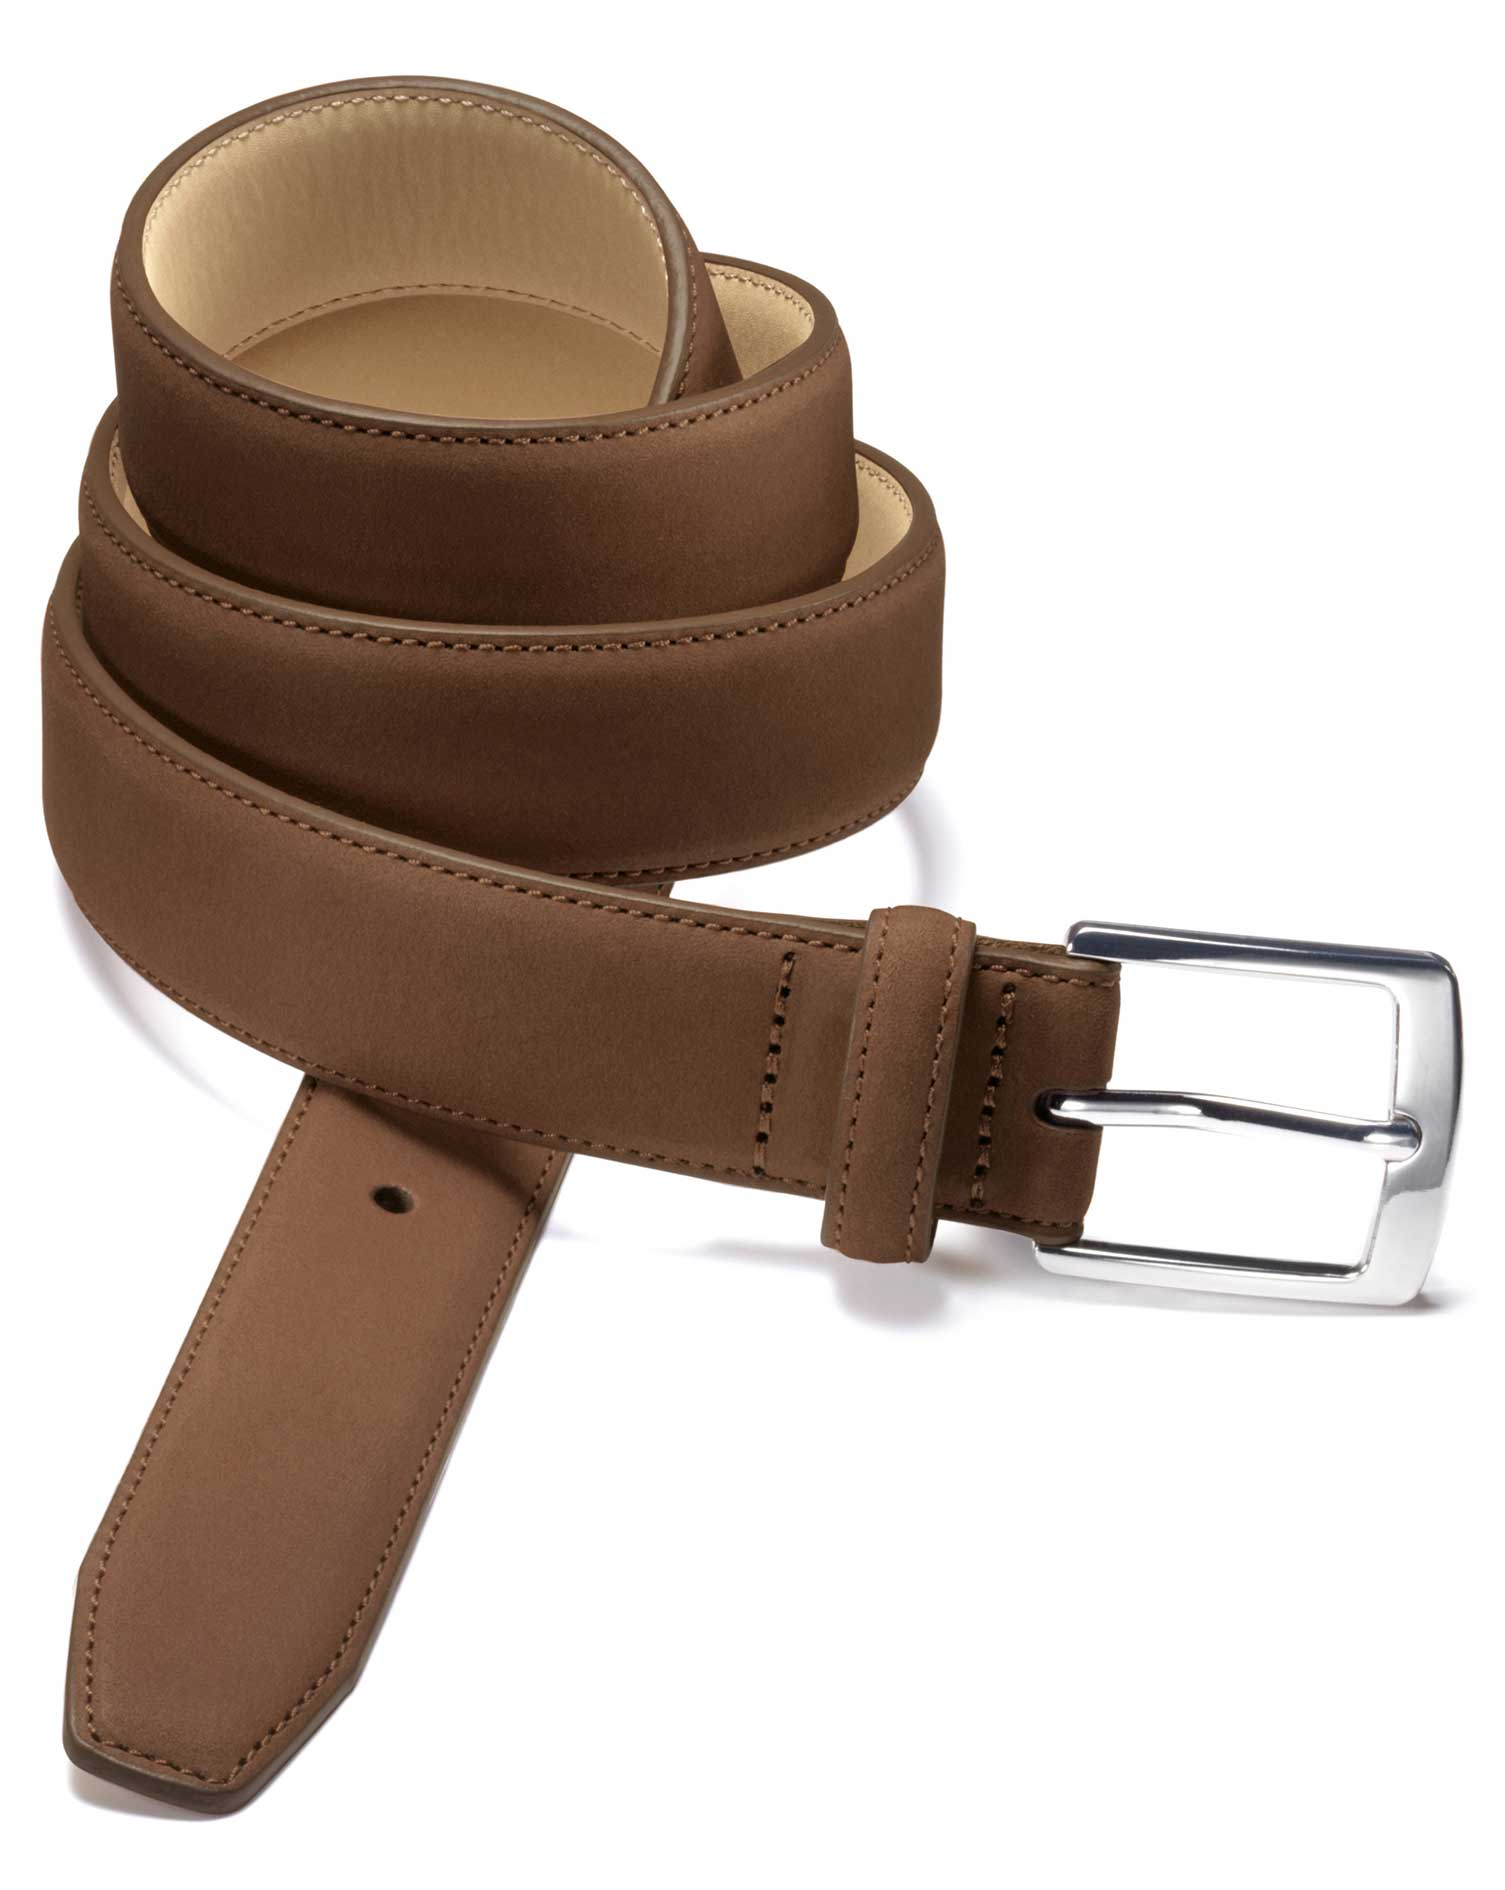 Tan Nubuck Leather Belt Size 34 by Charles Tyrwhitt